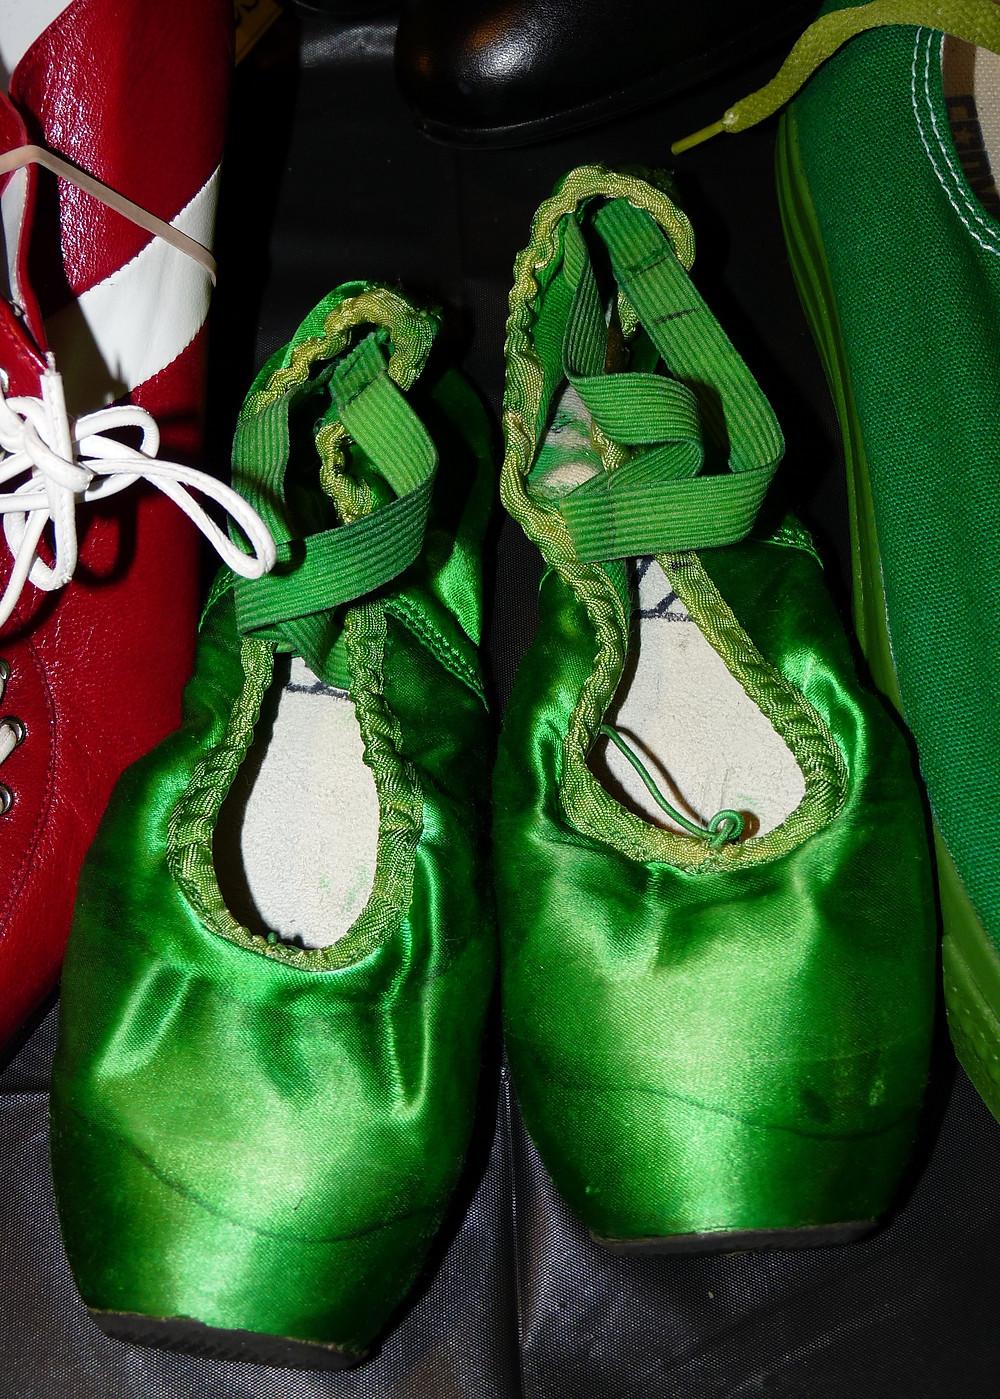 Broadway Cares Flea Market: Wicked Slippers